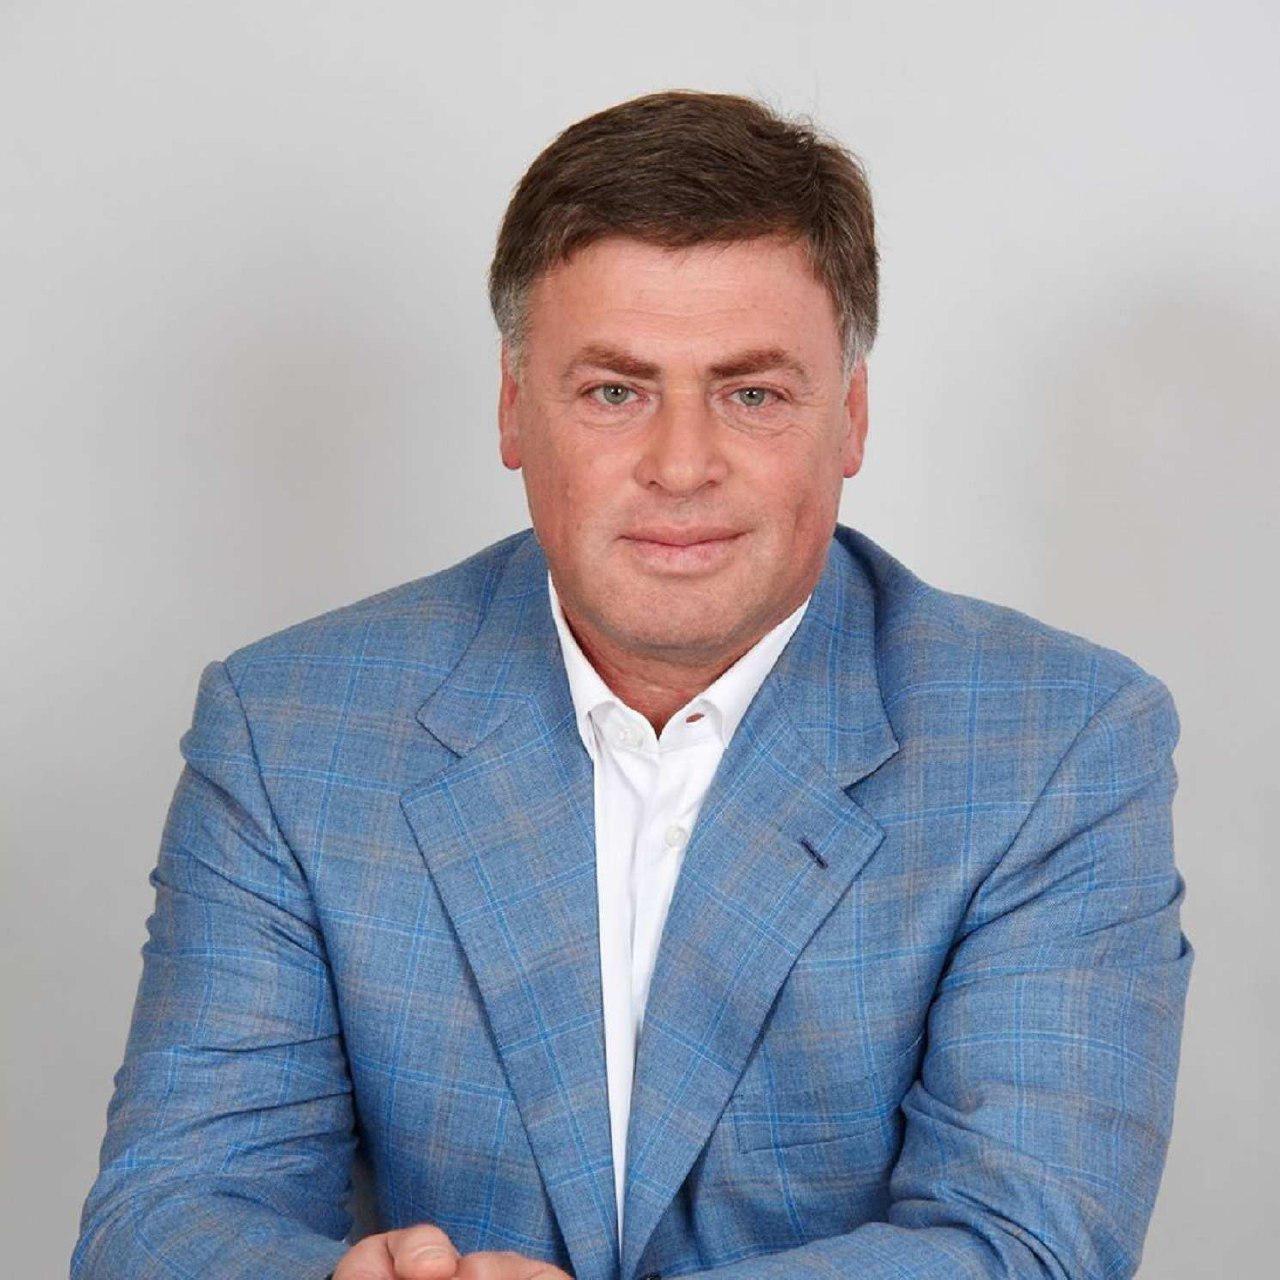 Анатолий Гиршфельд внес законопроект: плата за аренду паев у селян не меньше 7% стоимости земли, фото-1